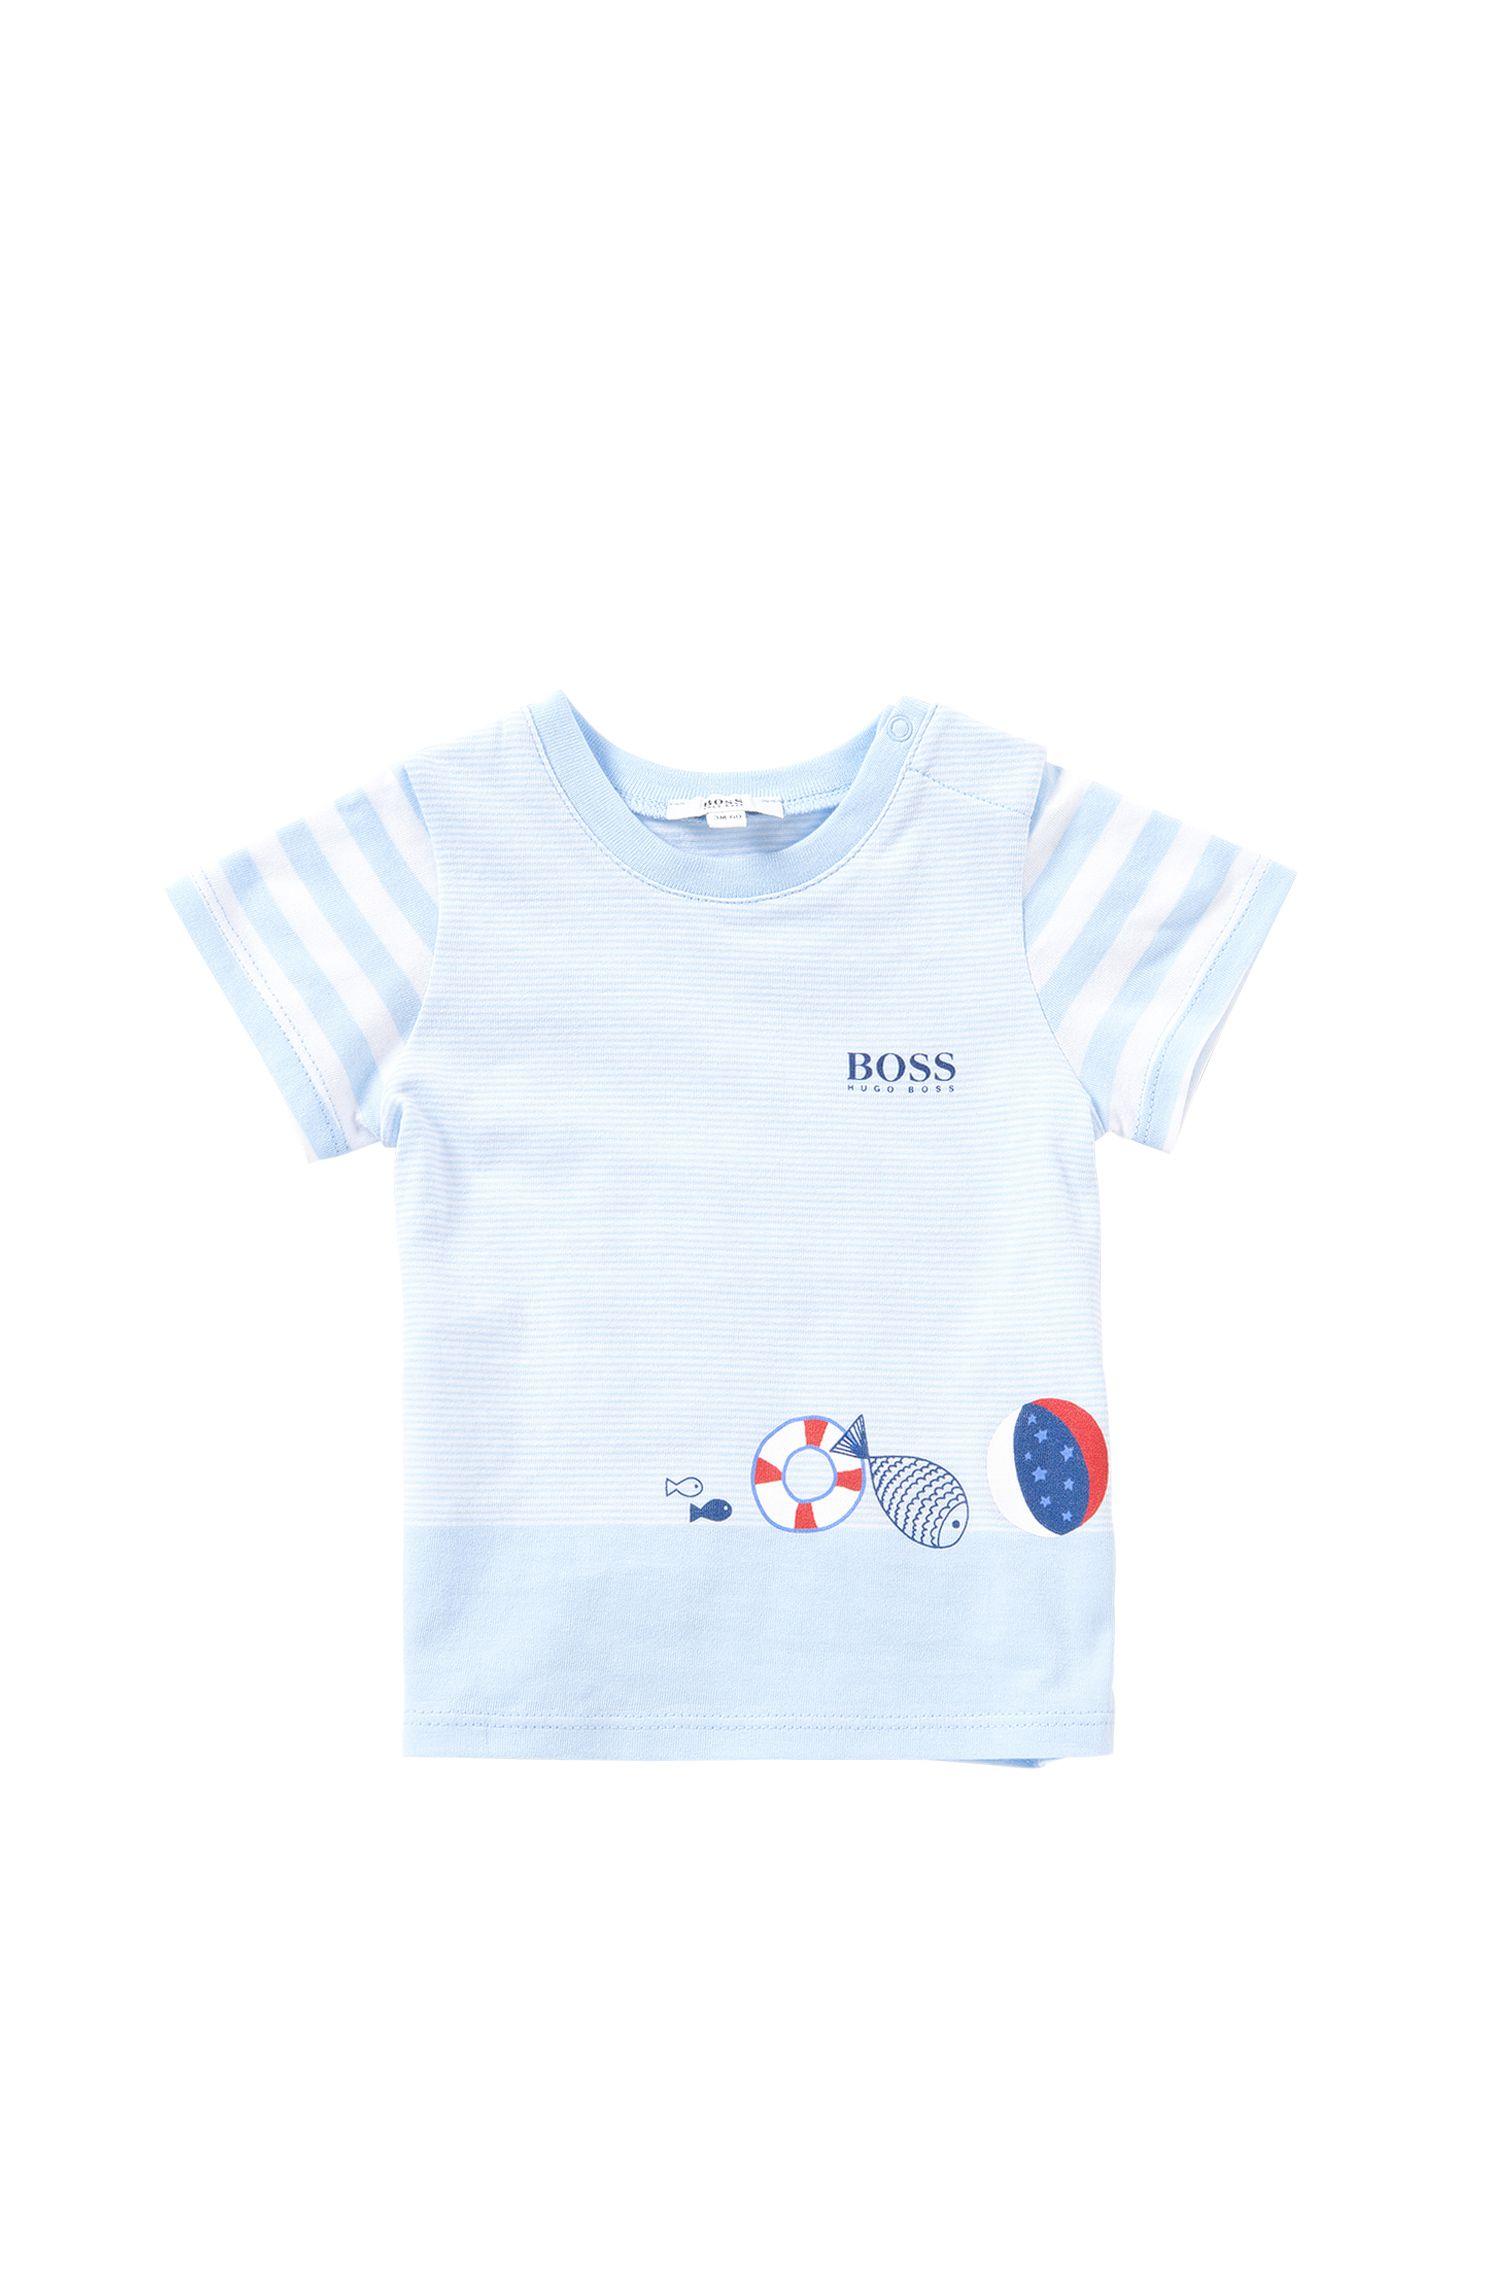 Camiseta a rayas para bebé en algodón elástico: 'J95192'